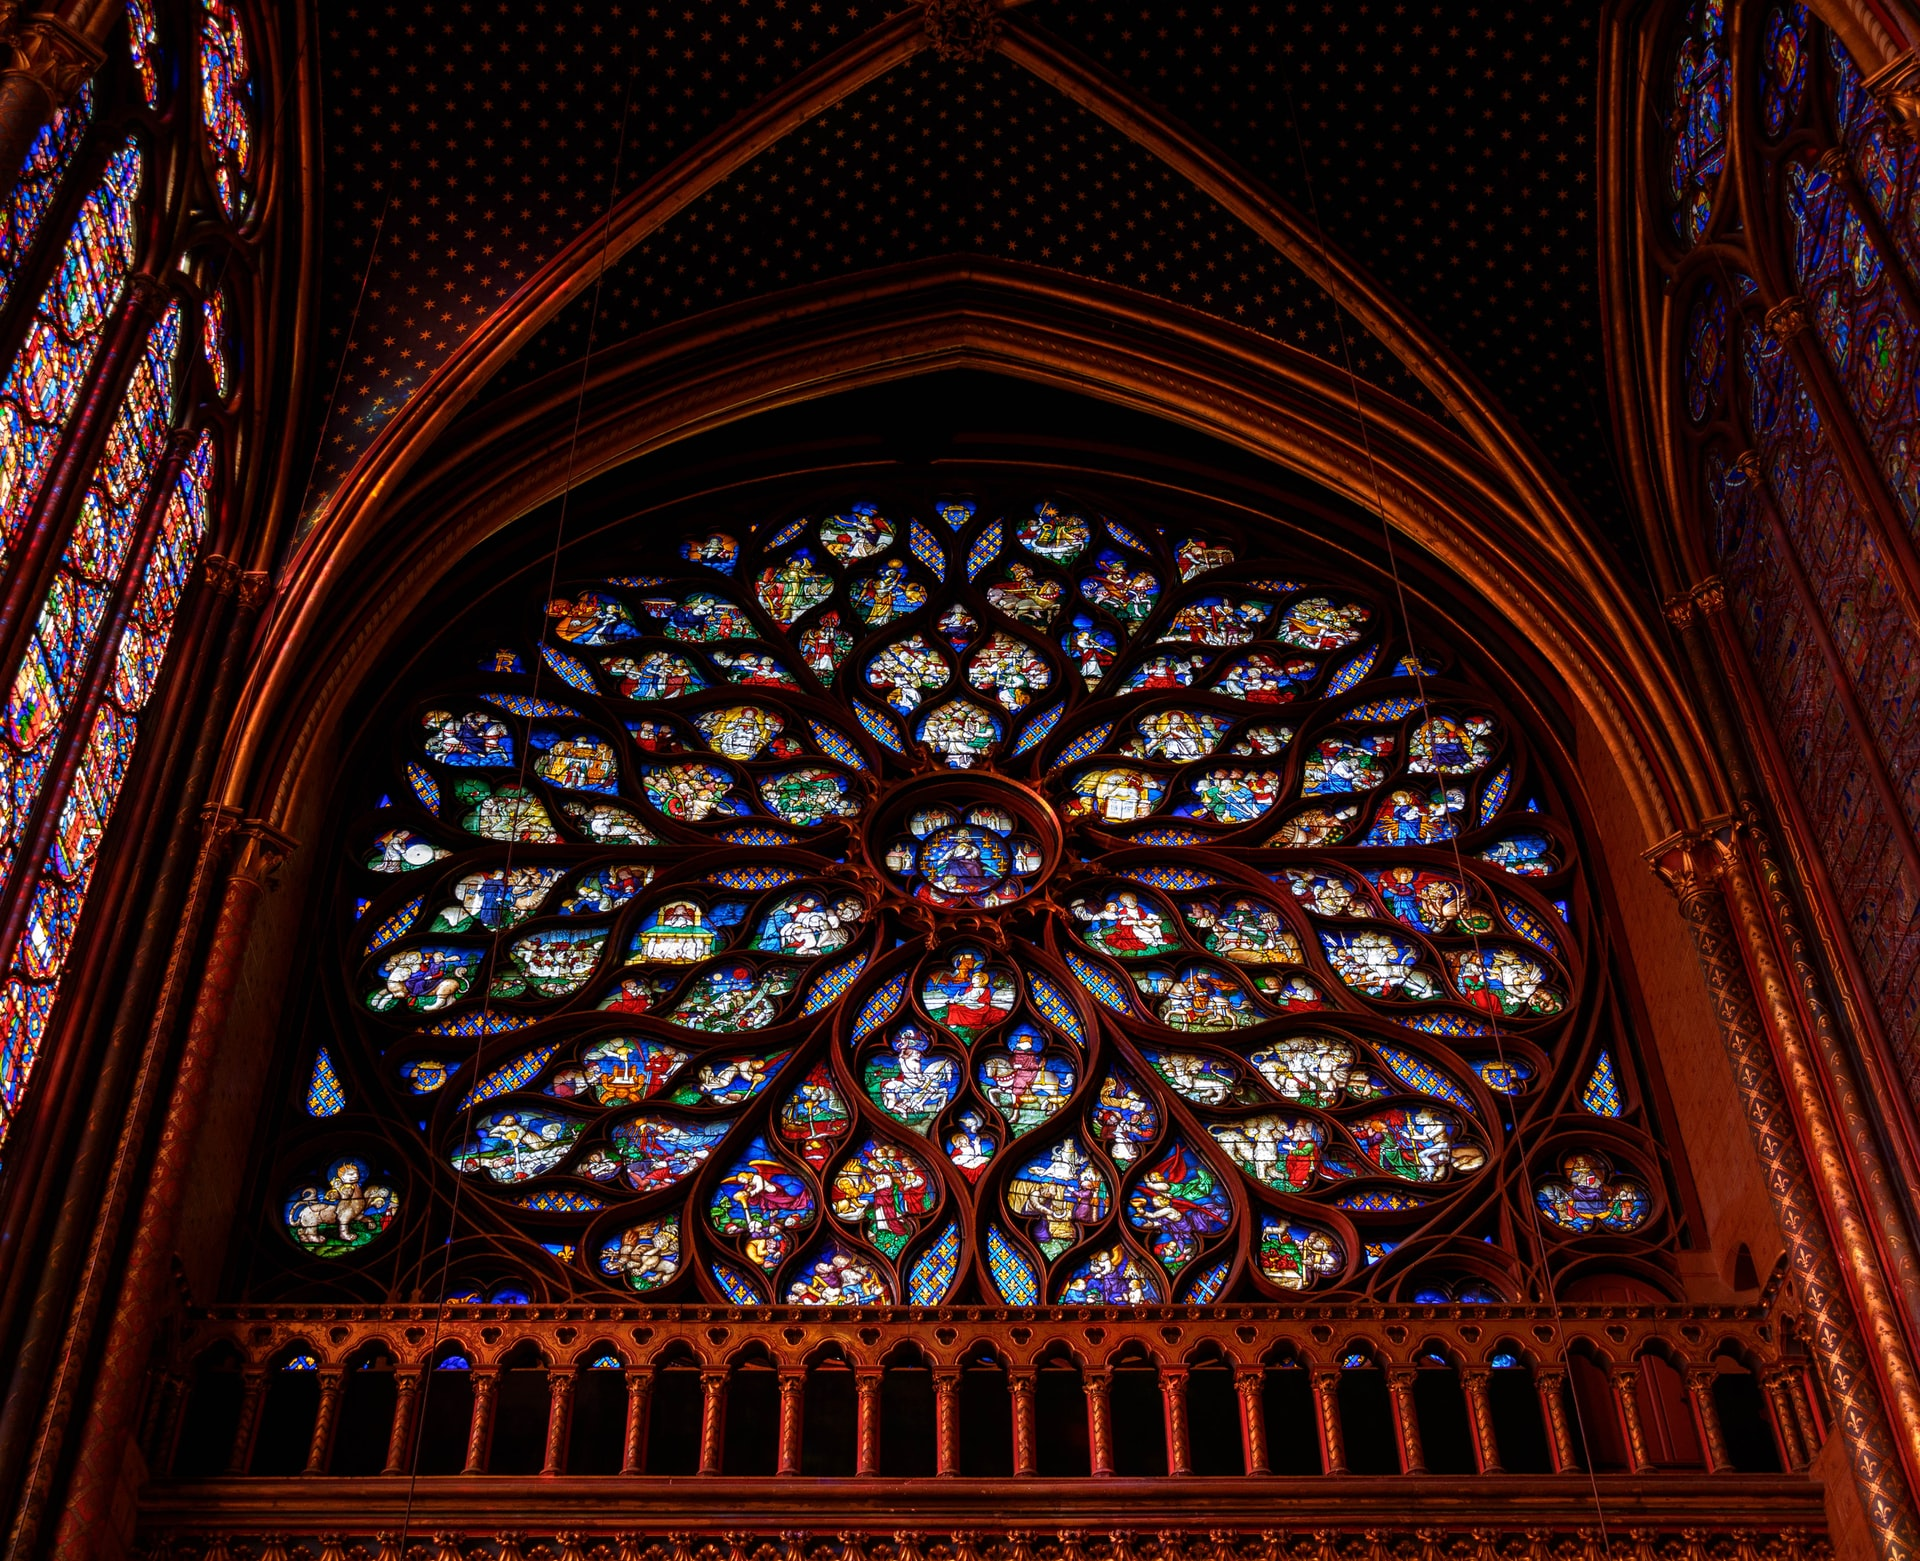 Rose window at Sainte-Chapelle